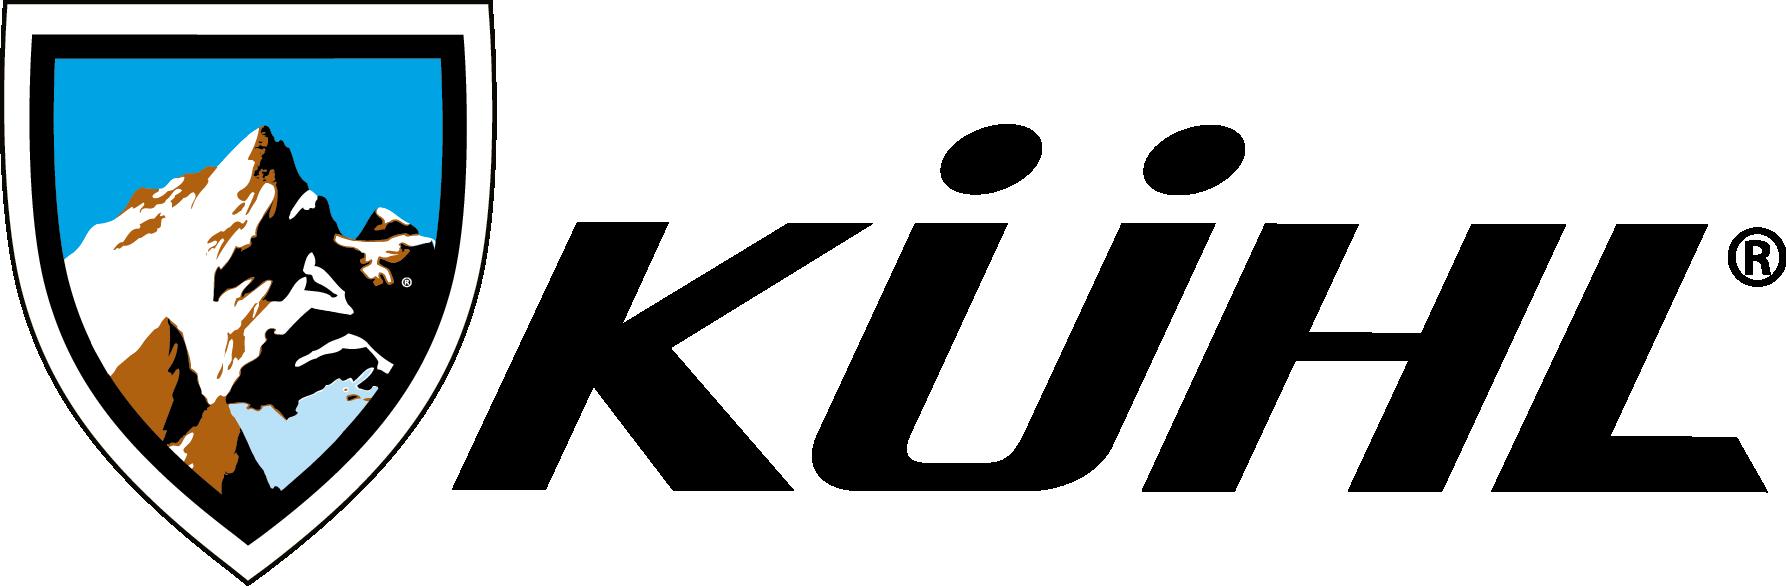 logo_horizontal_black-text.png